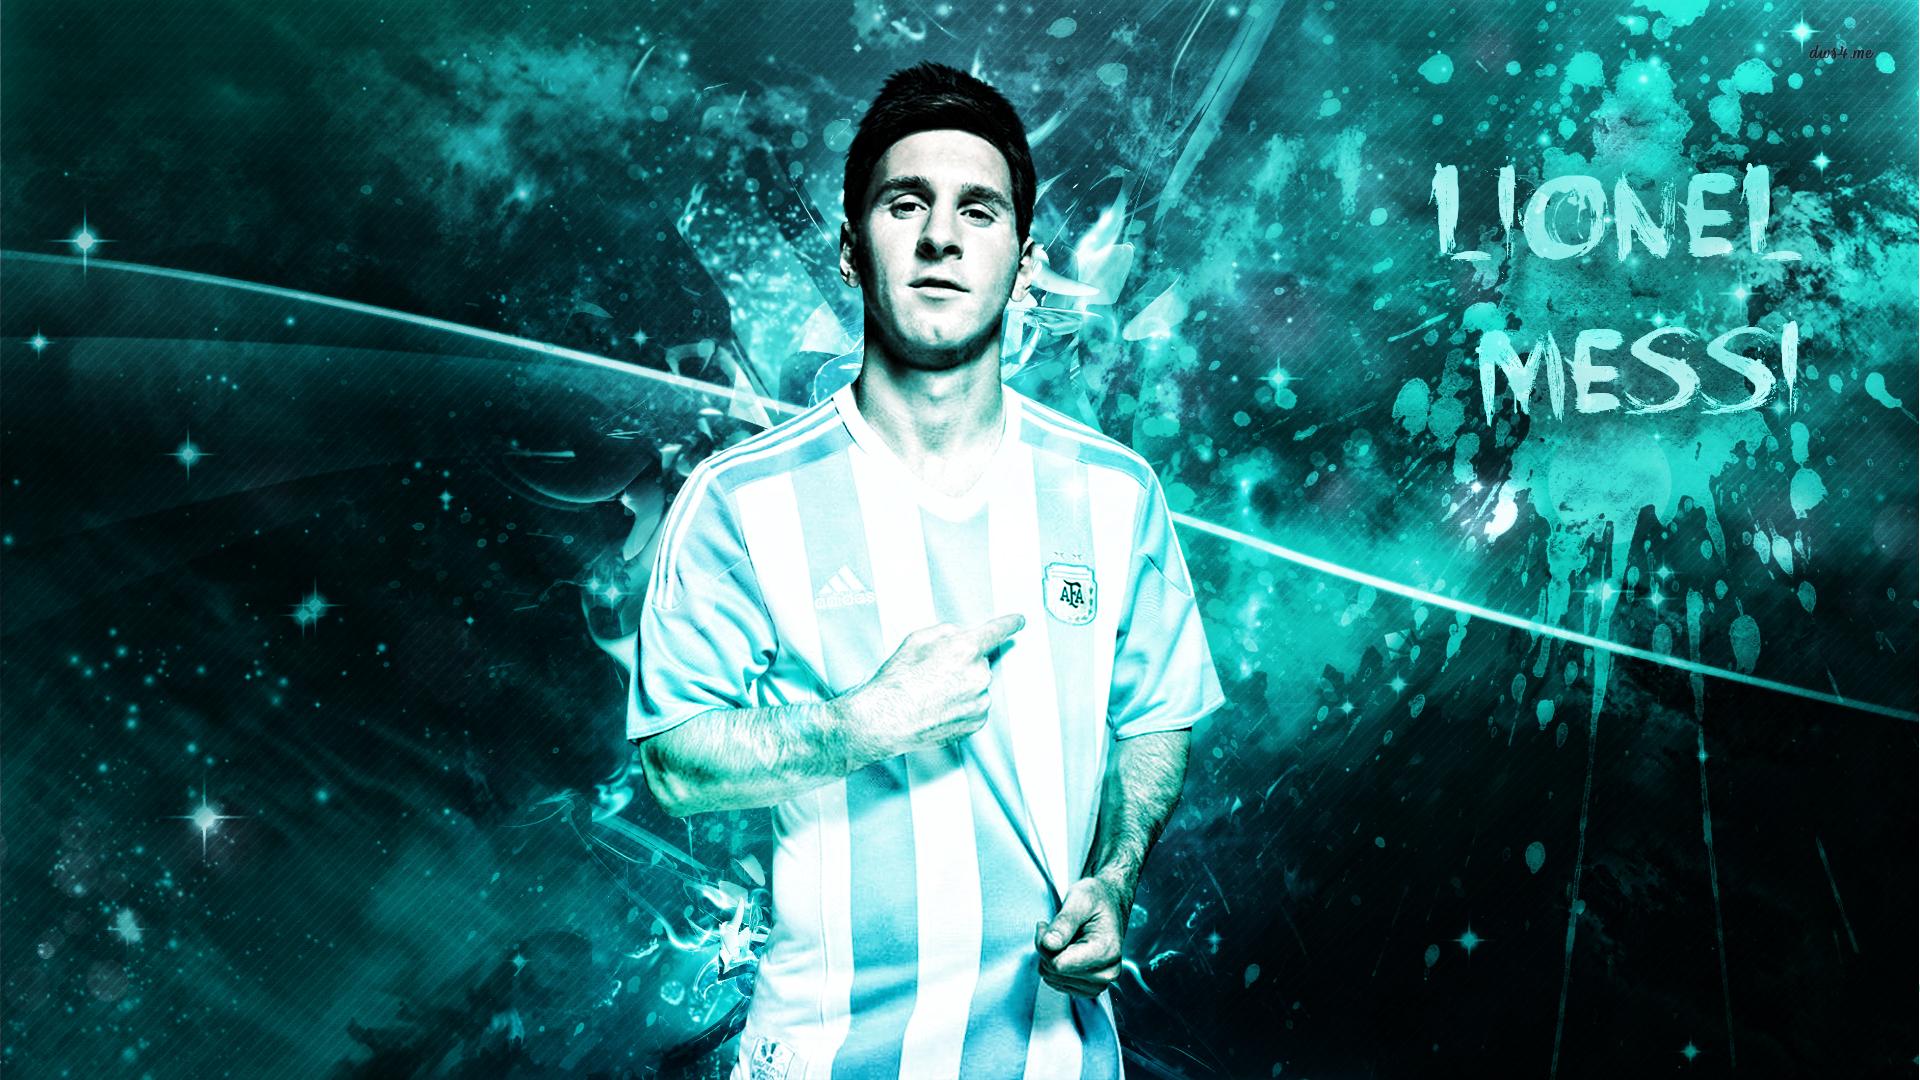 Lionel Messi 2015 Wallpaper By RakaGFX On DeviantArt